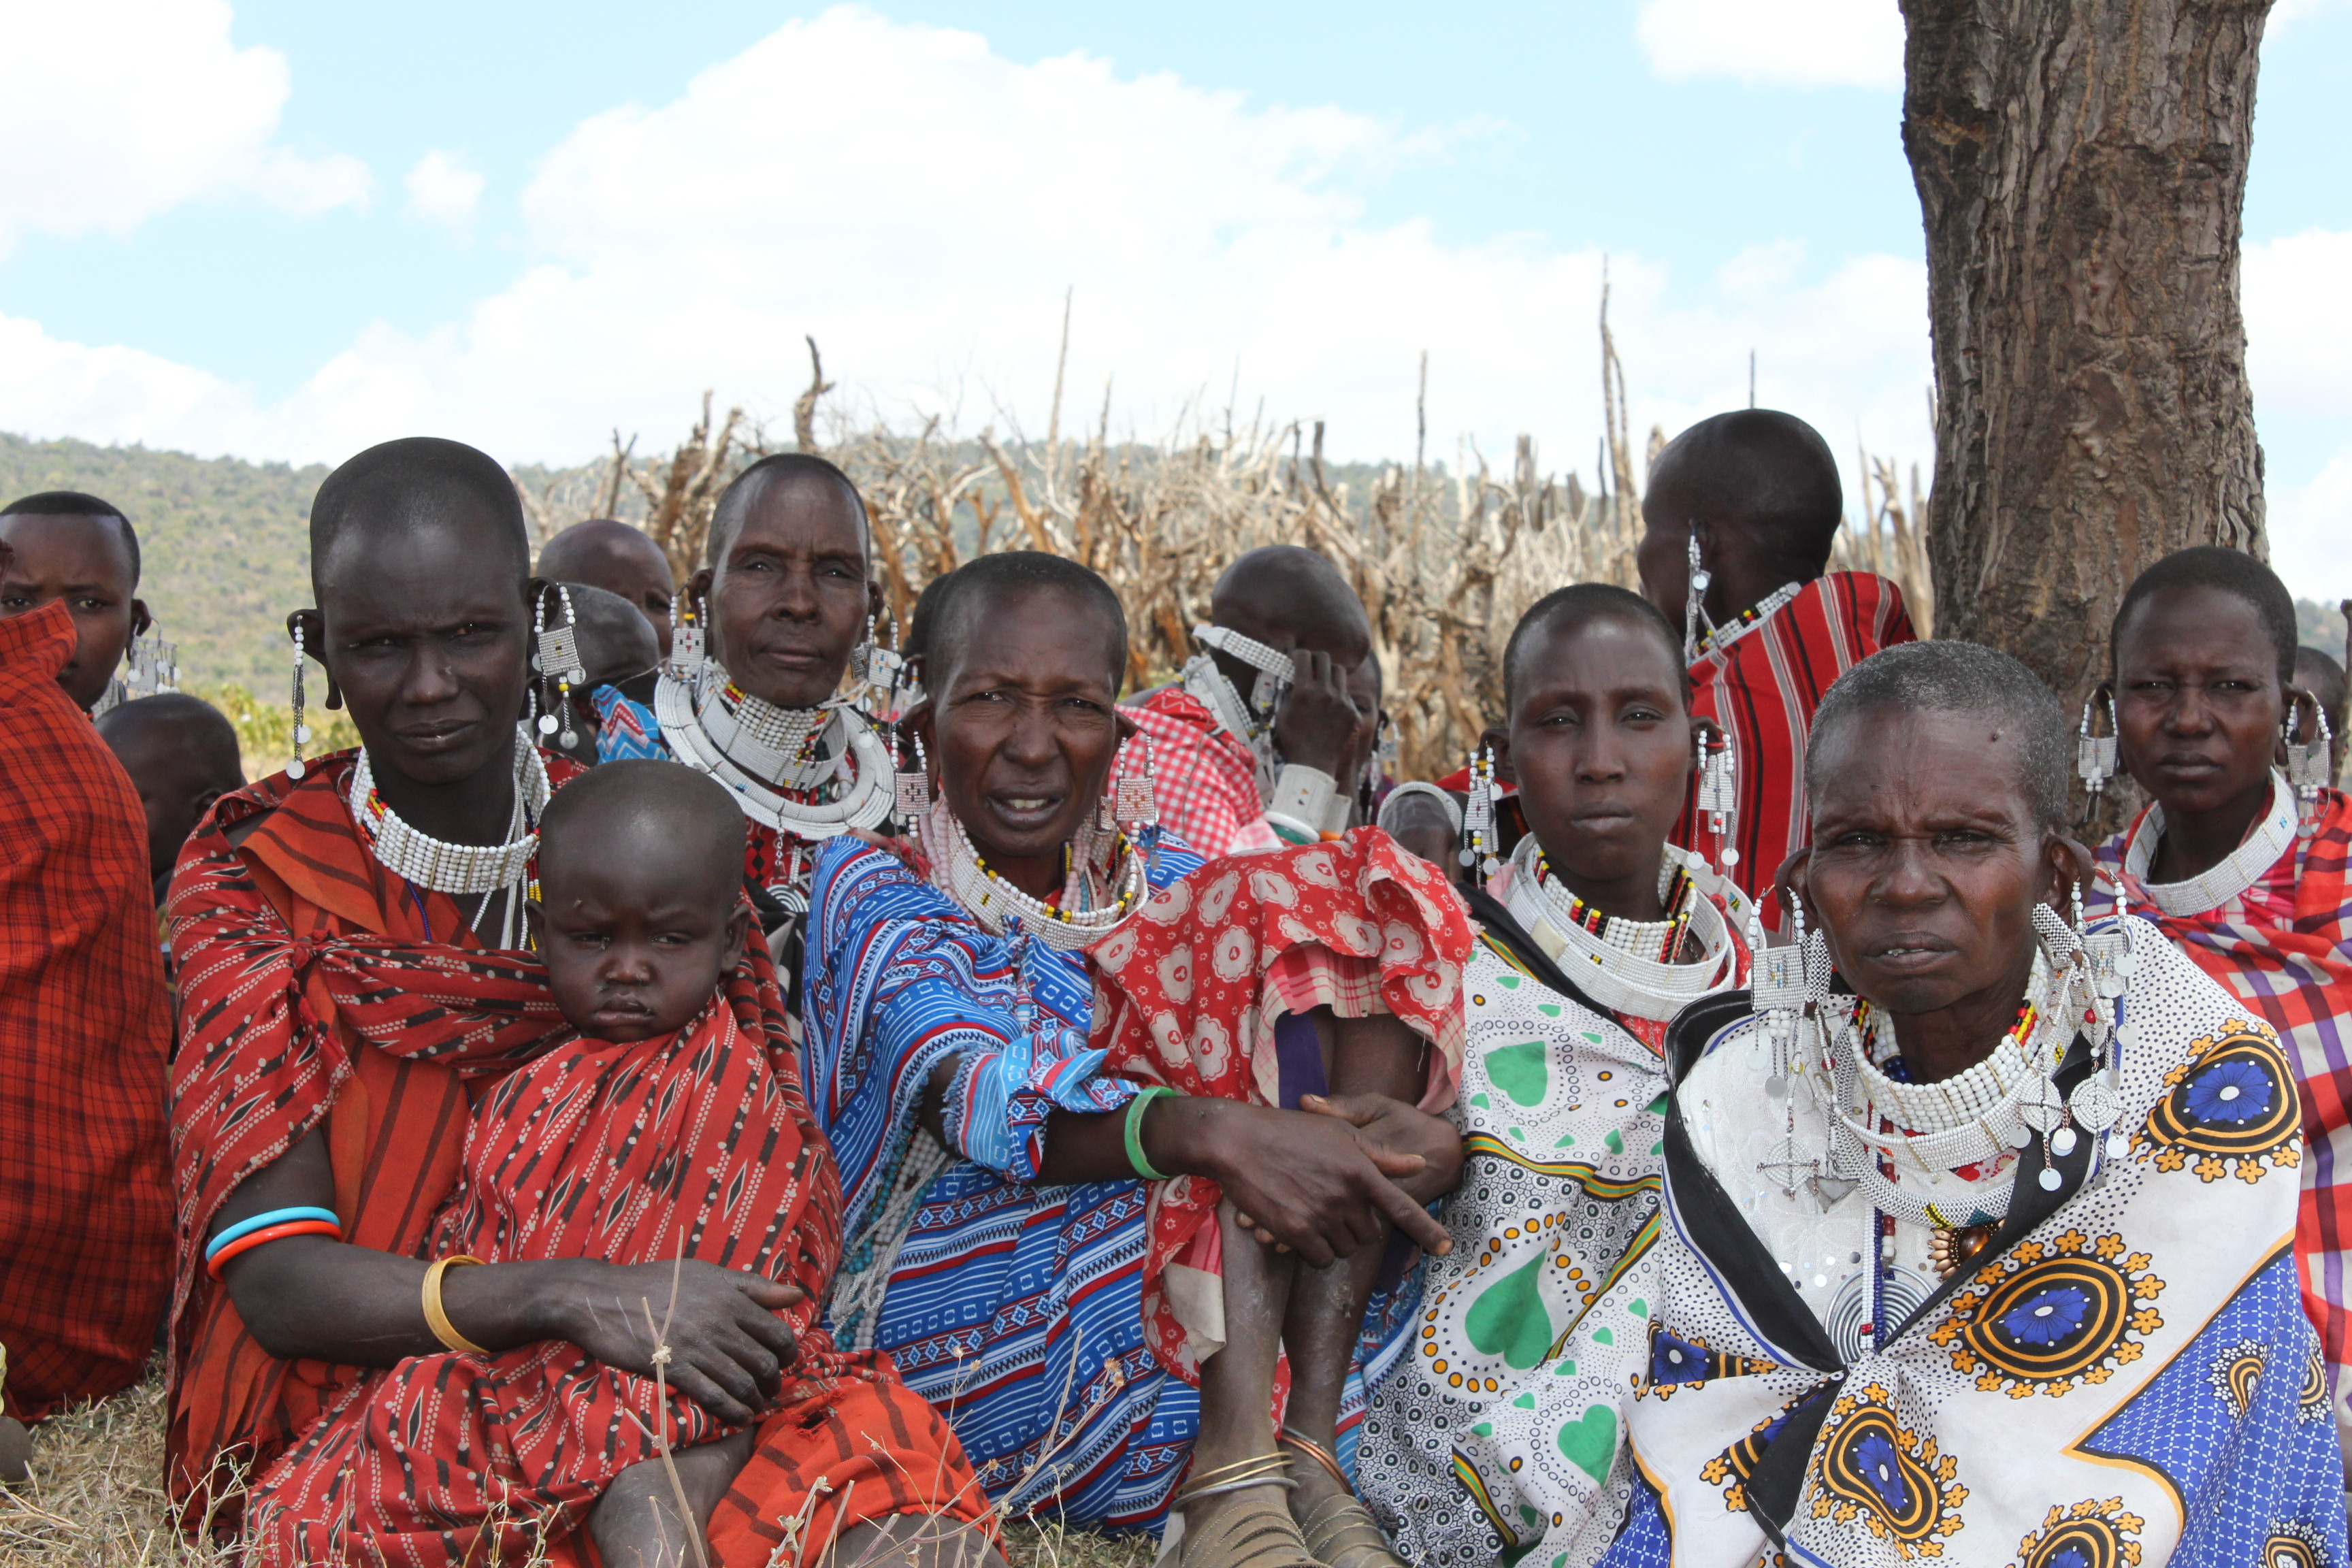 Maasai women of Sukenya village. Copyright Carla Clarke, MRG.